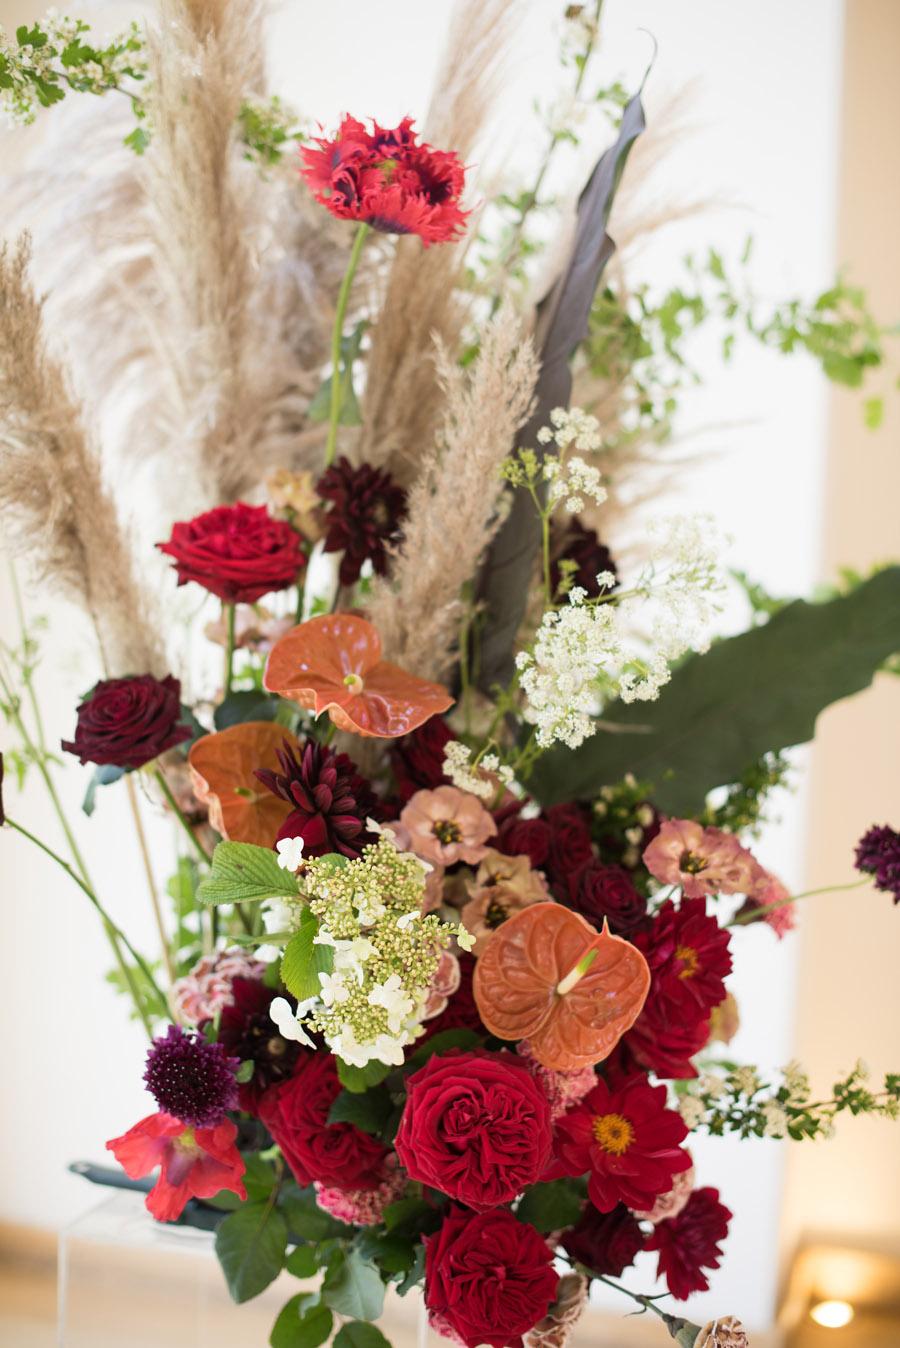 floral wedding ideas at Millbridge Court on English Wedding - photo credit Julie Michaelsen Photography (12)